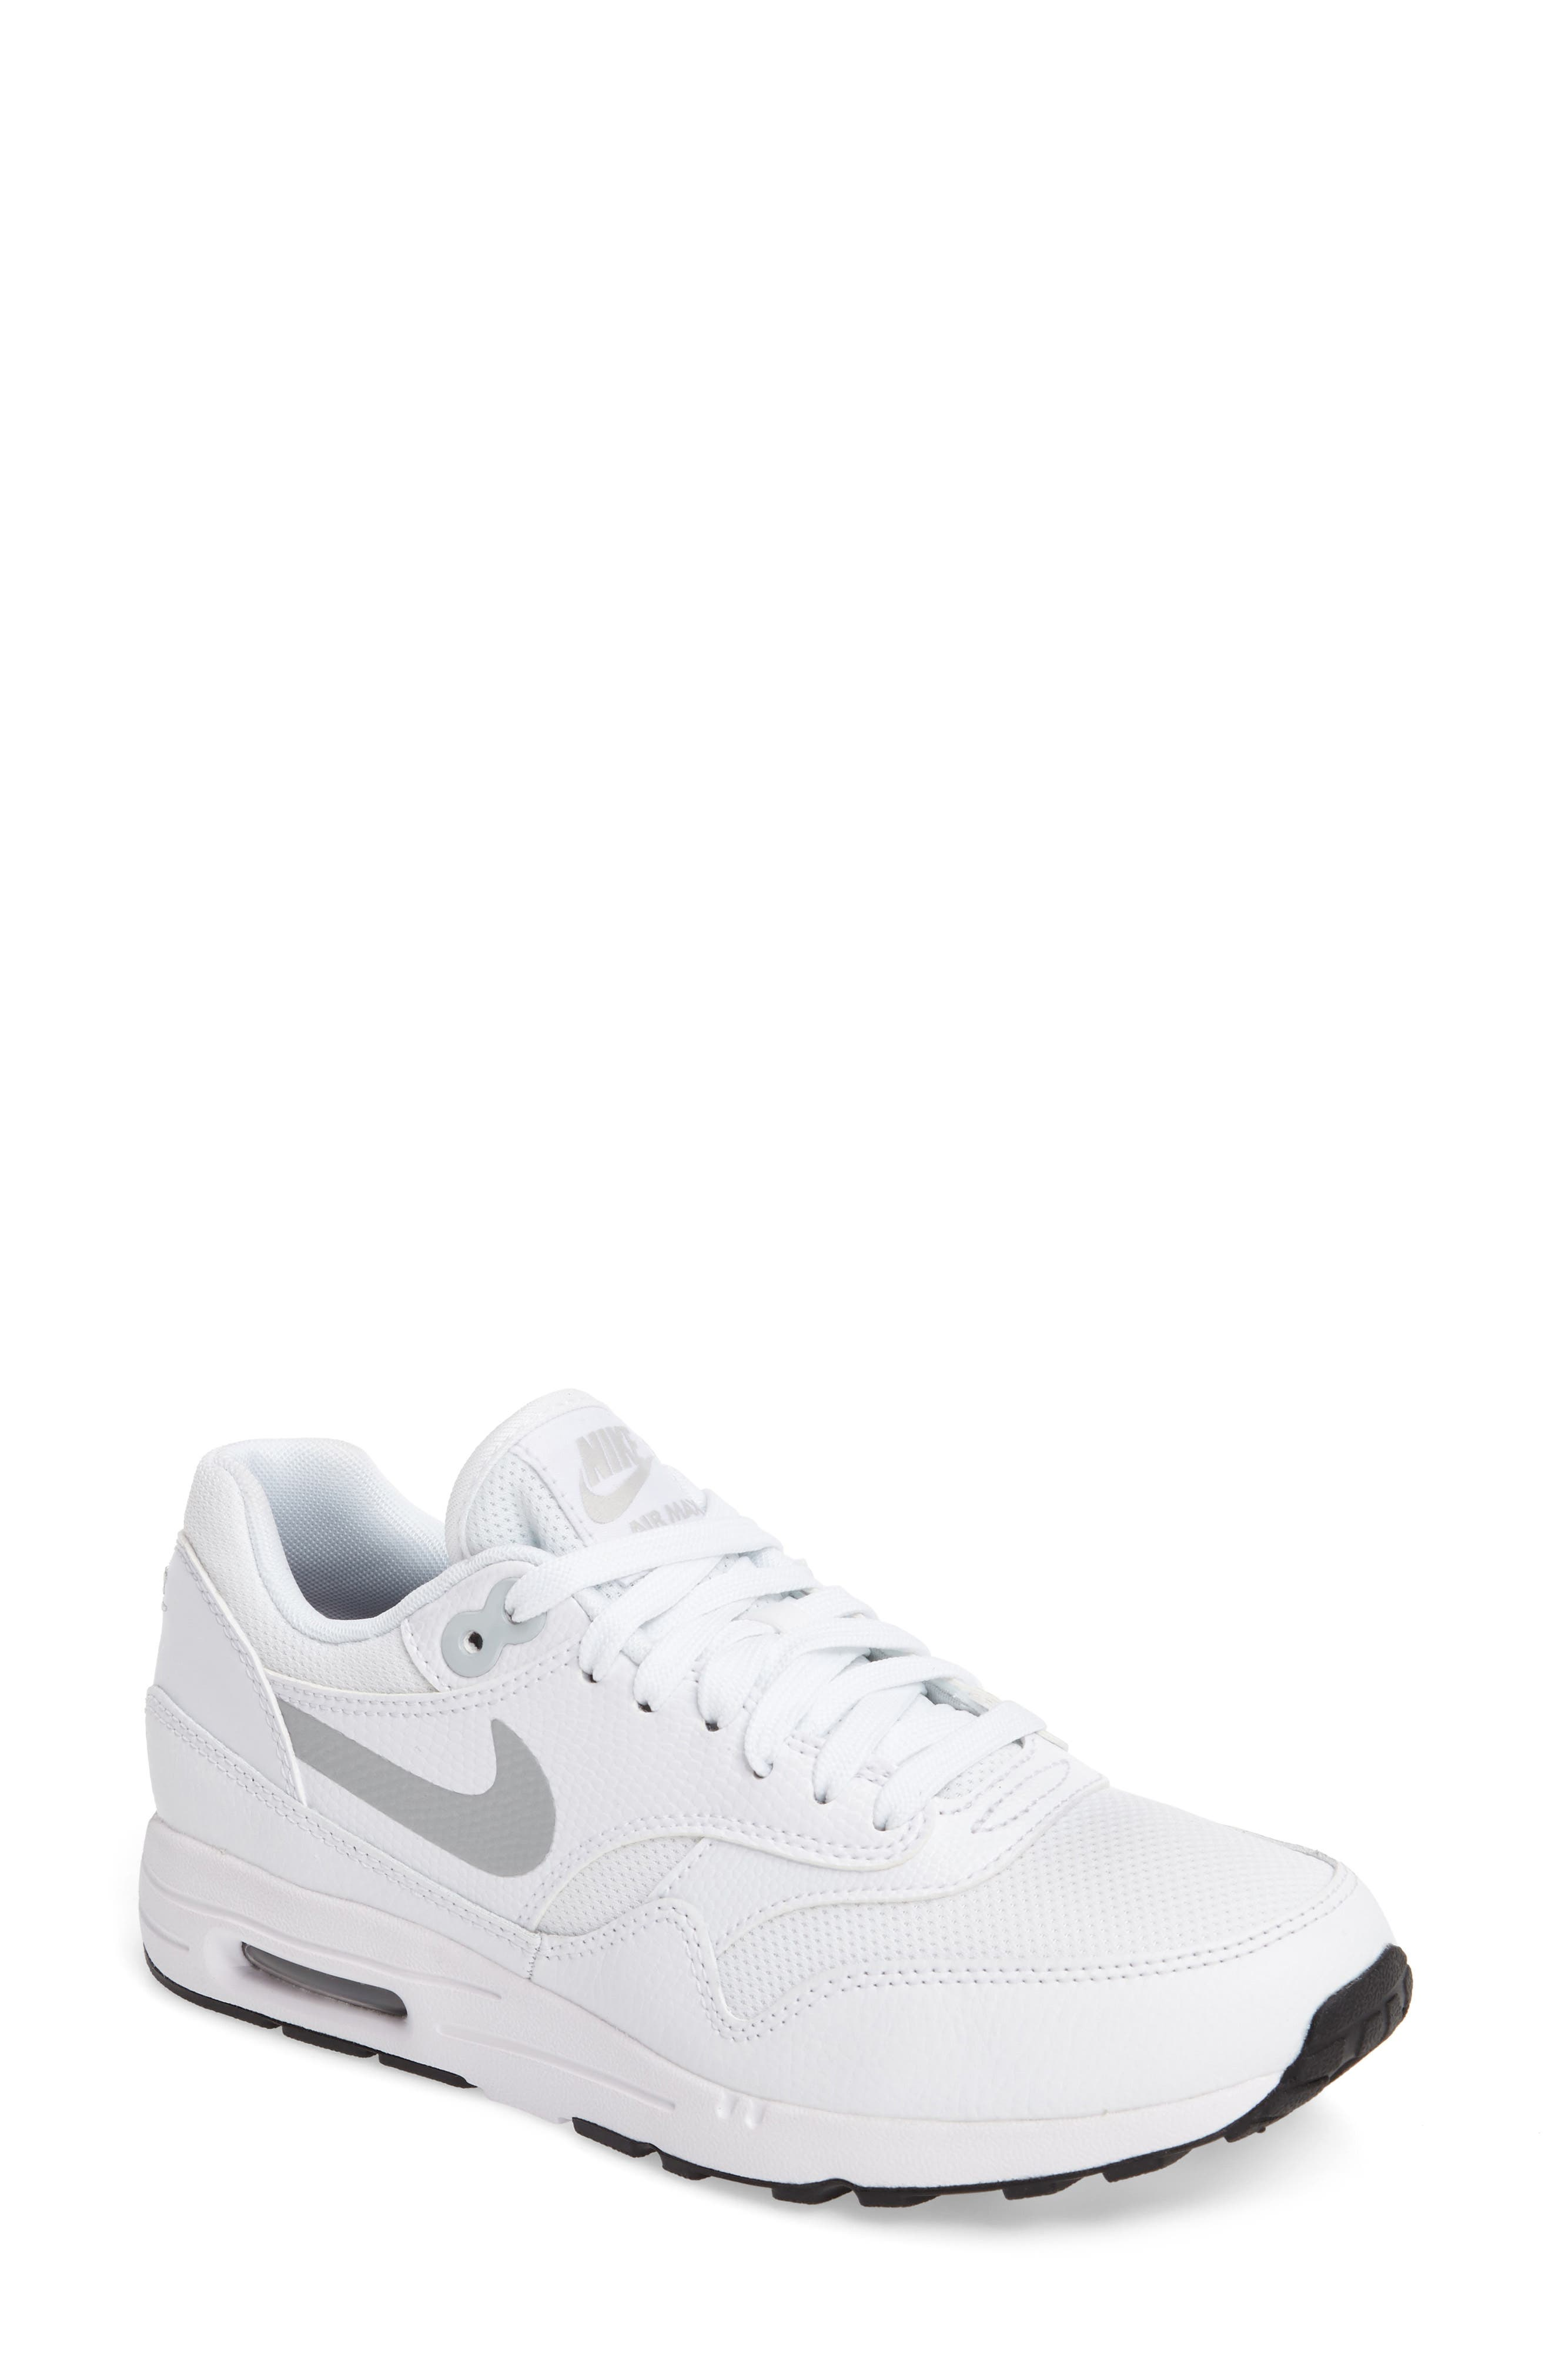 Air Max 1 Ultra 2.0 Running Shoe,                         Main,                         color, White/ Platinum/ Black/ White